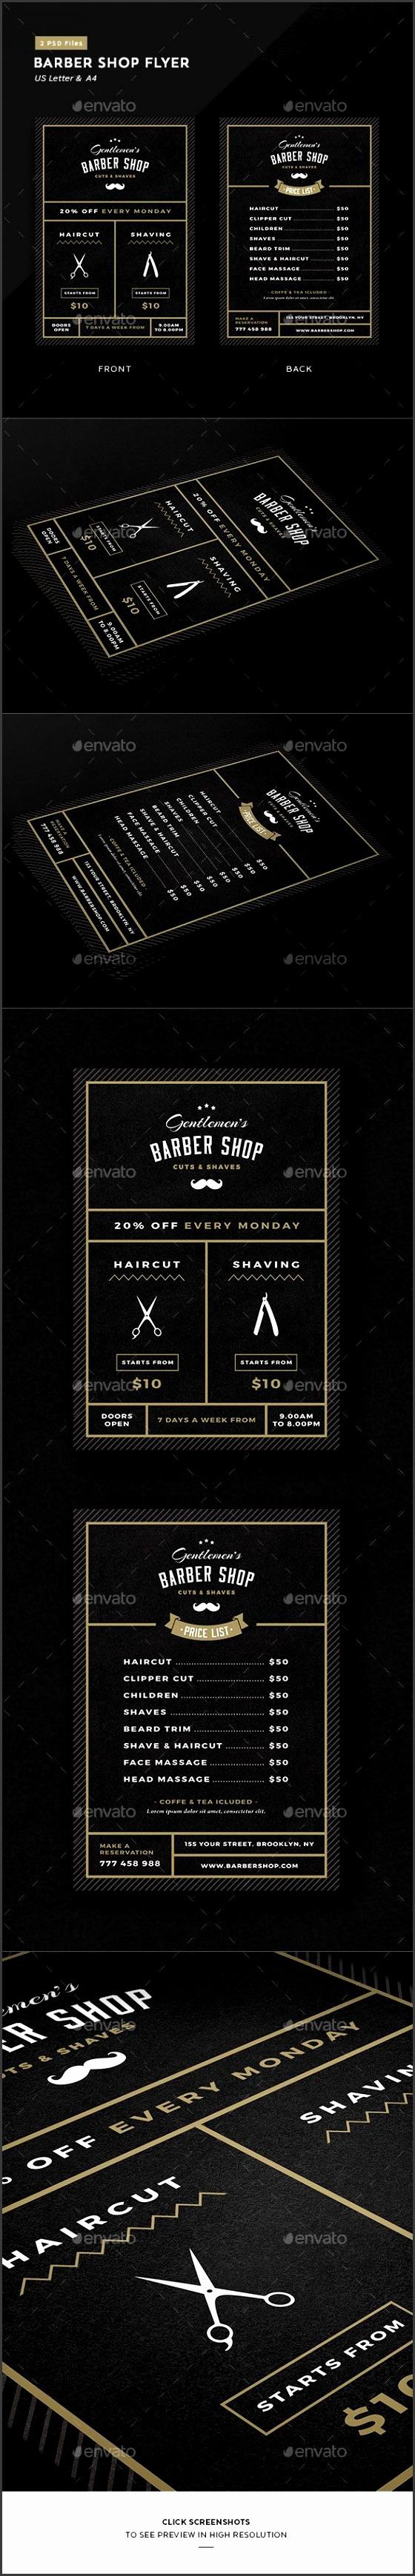 Barbershop Flyer Barbershop IdeasBarbershop DesignPsd TemplatesFlyer TemplatePrice ListBrochure